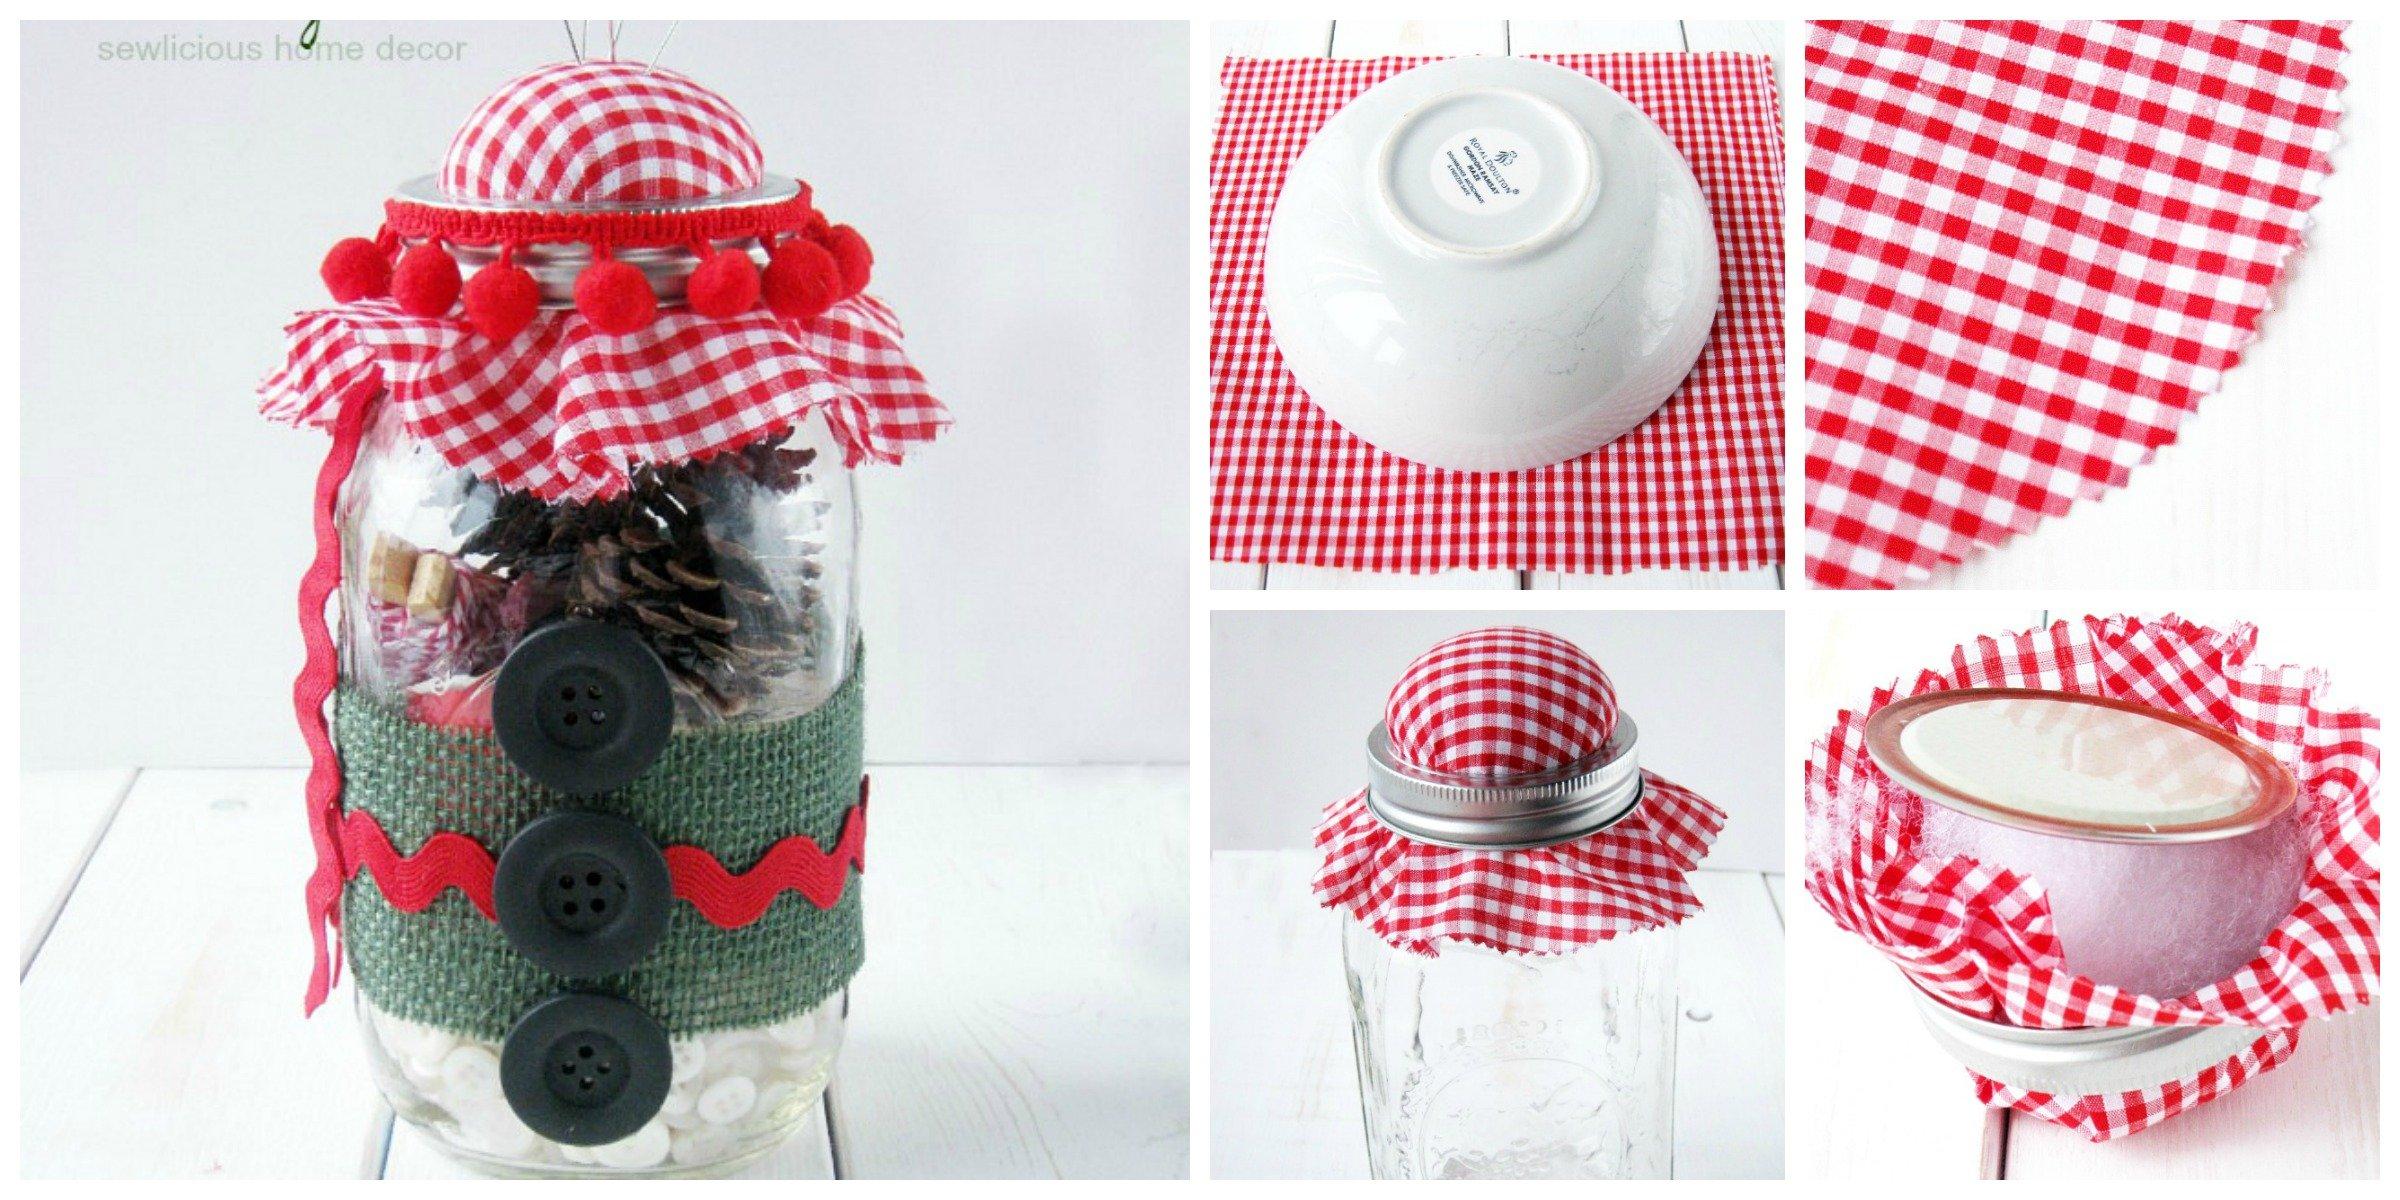 Christmas Sewing Kit tutorial